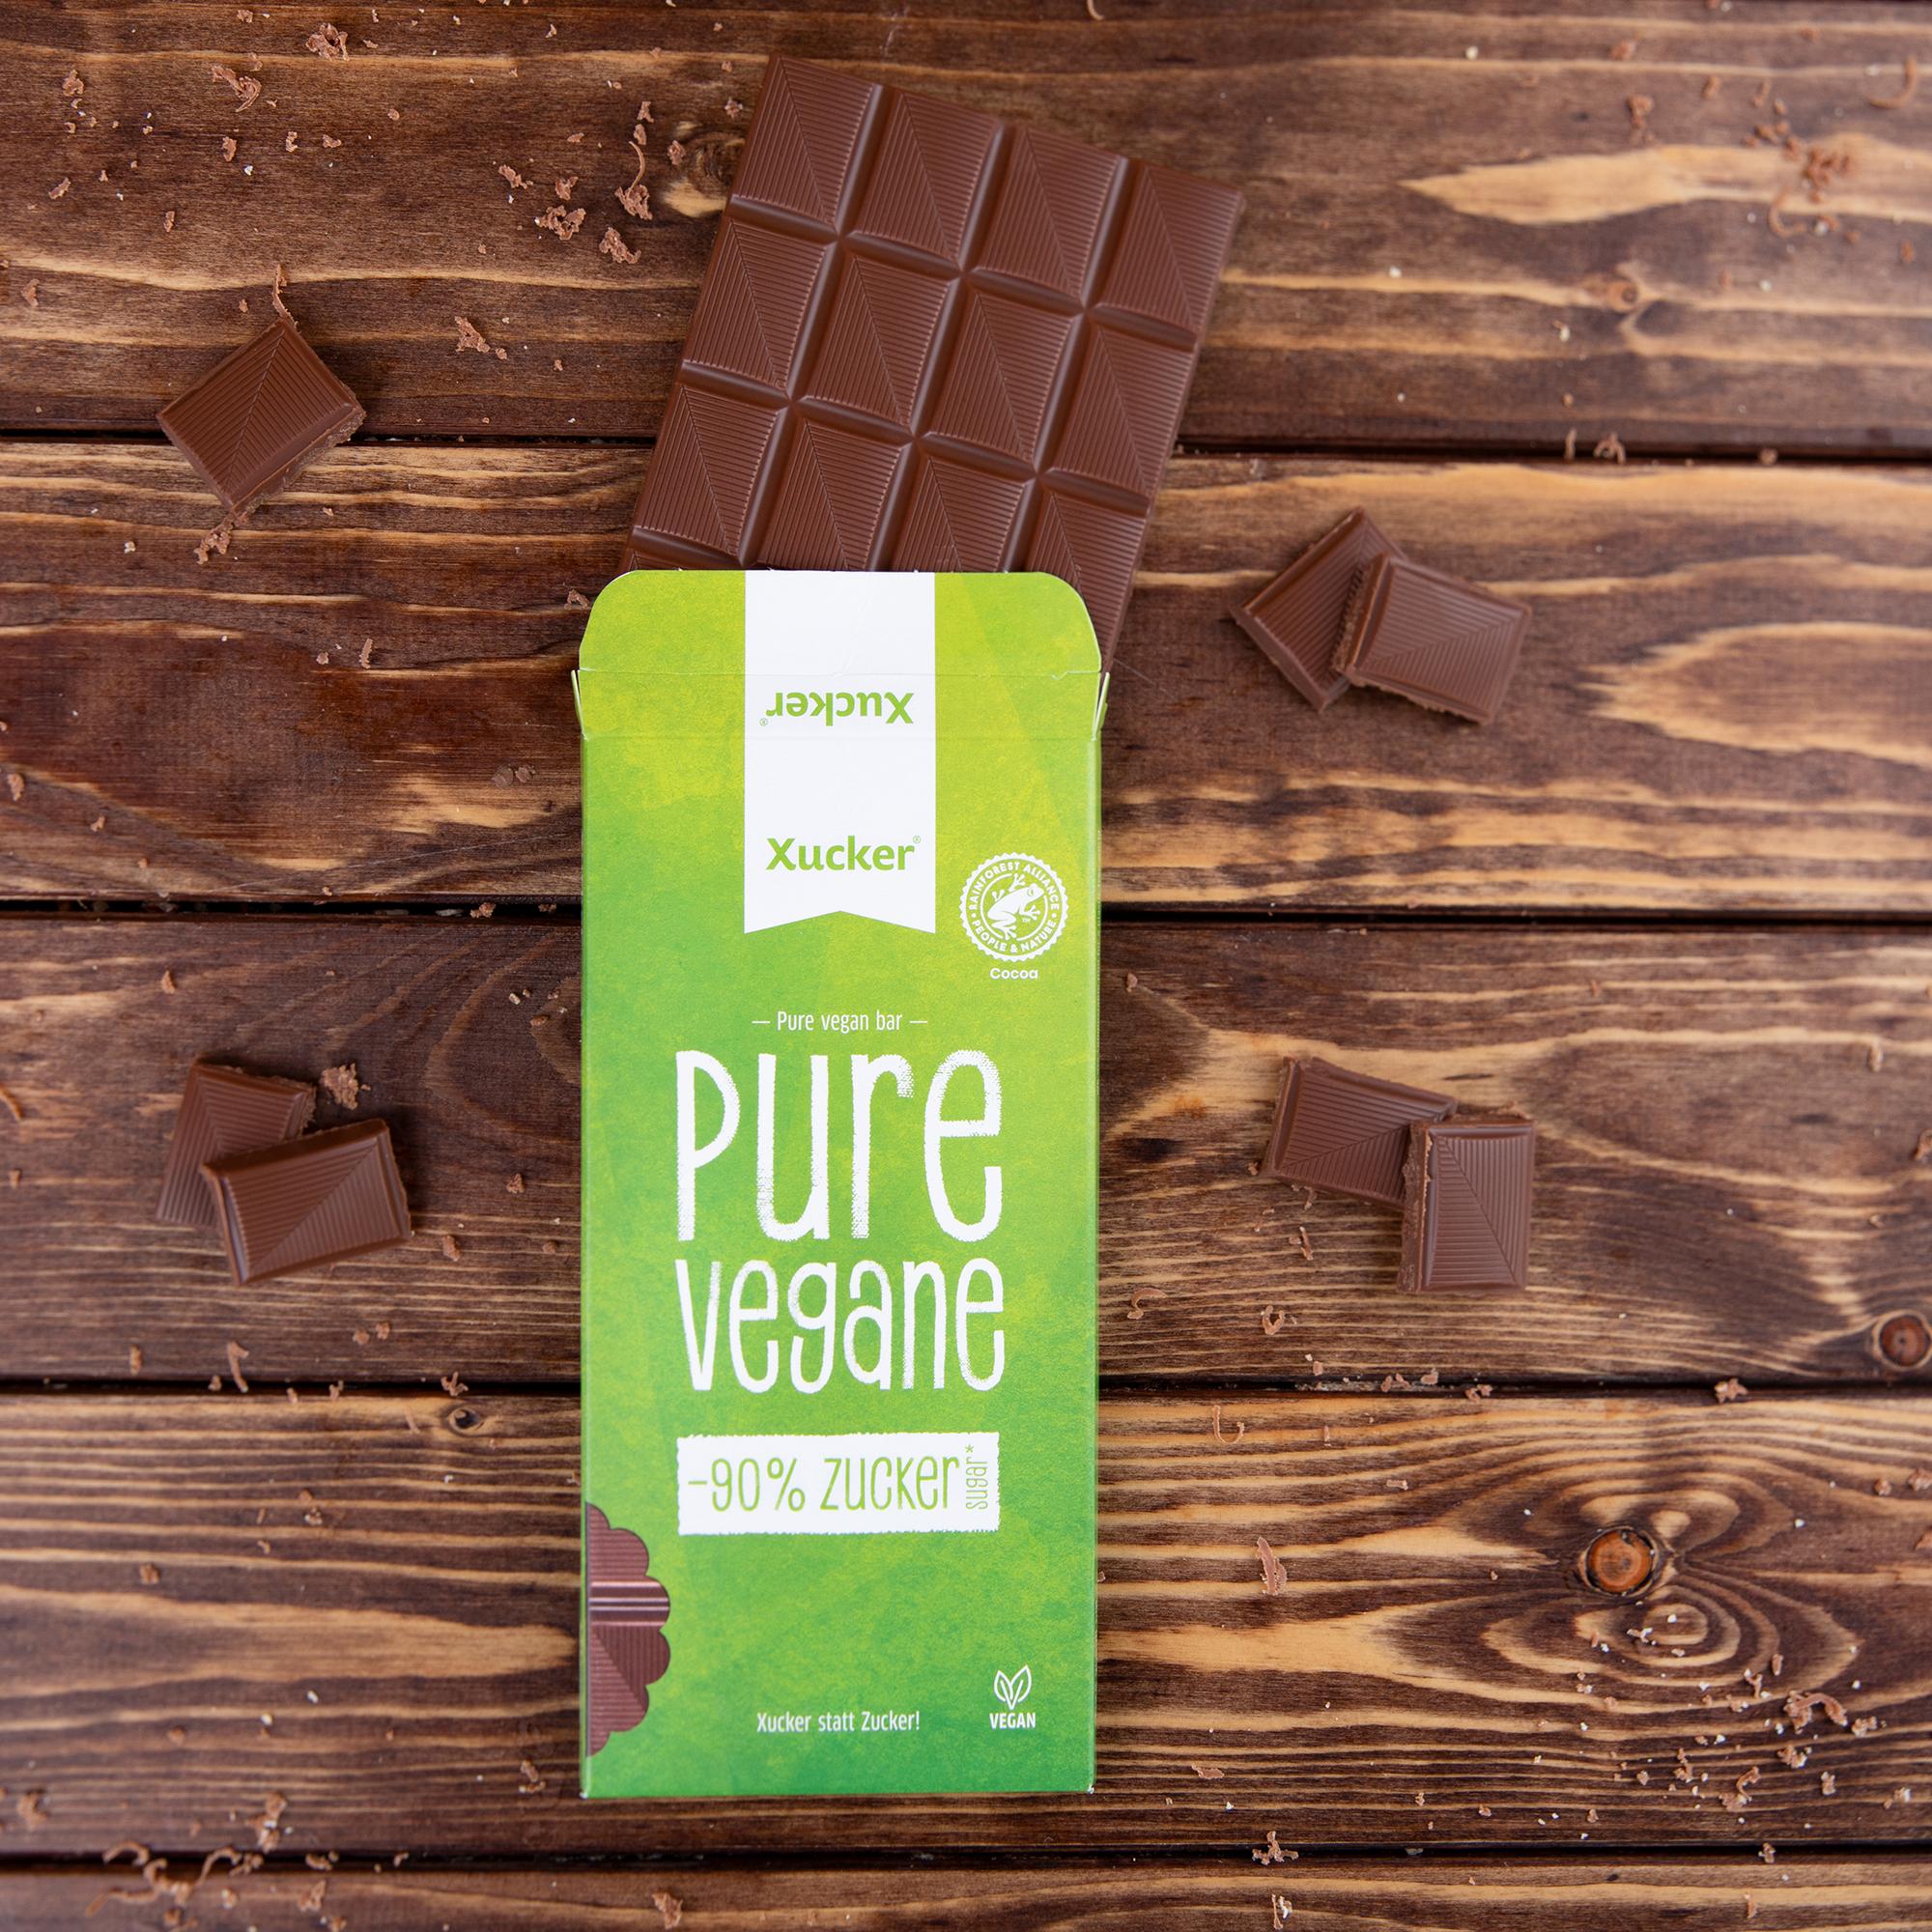 Vegane Schokolade Pure Vegane ohne Zuckerzusatz